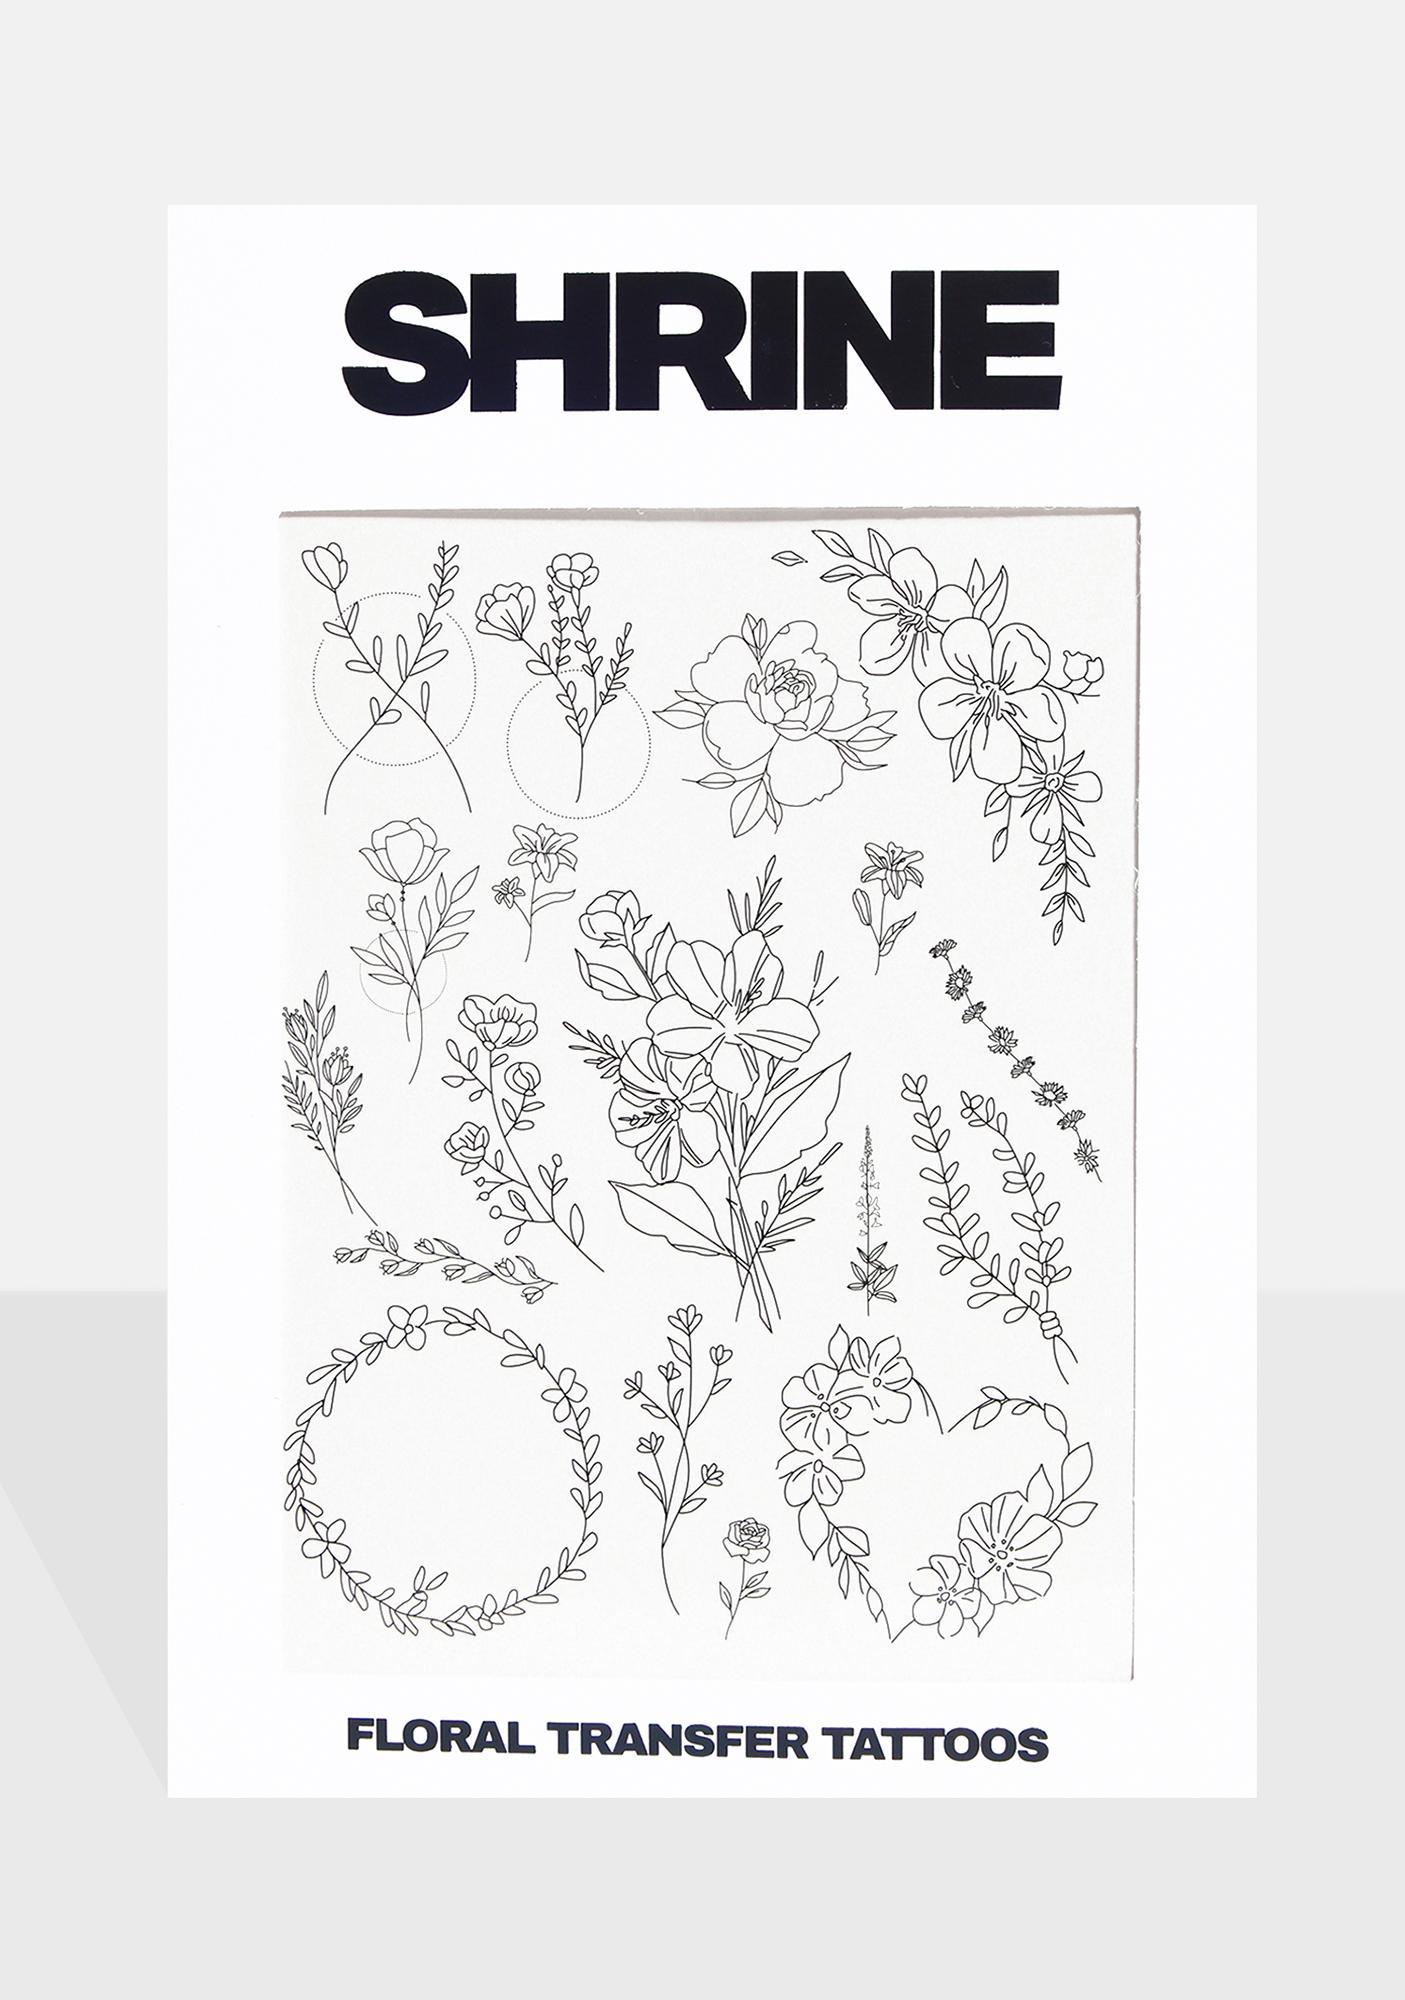 SHRINE Floral Transfer Tattoos